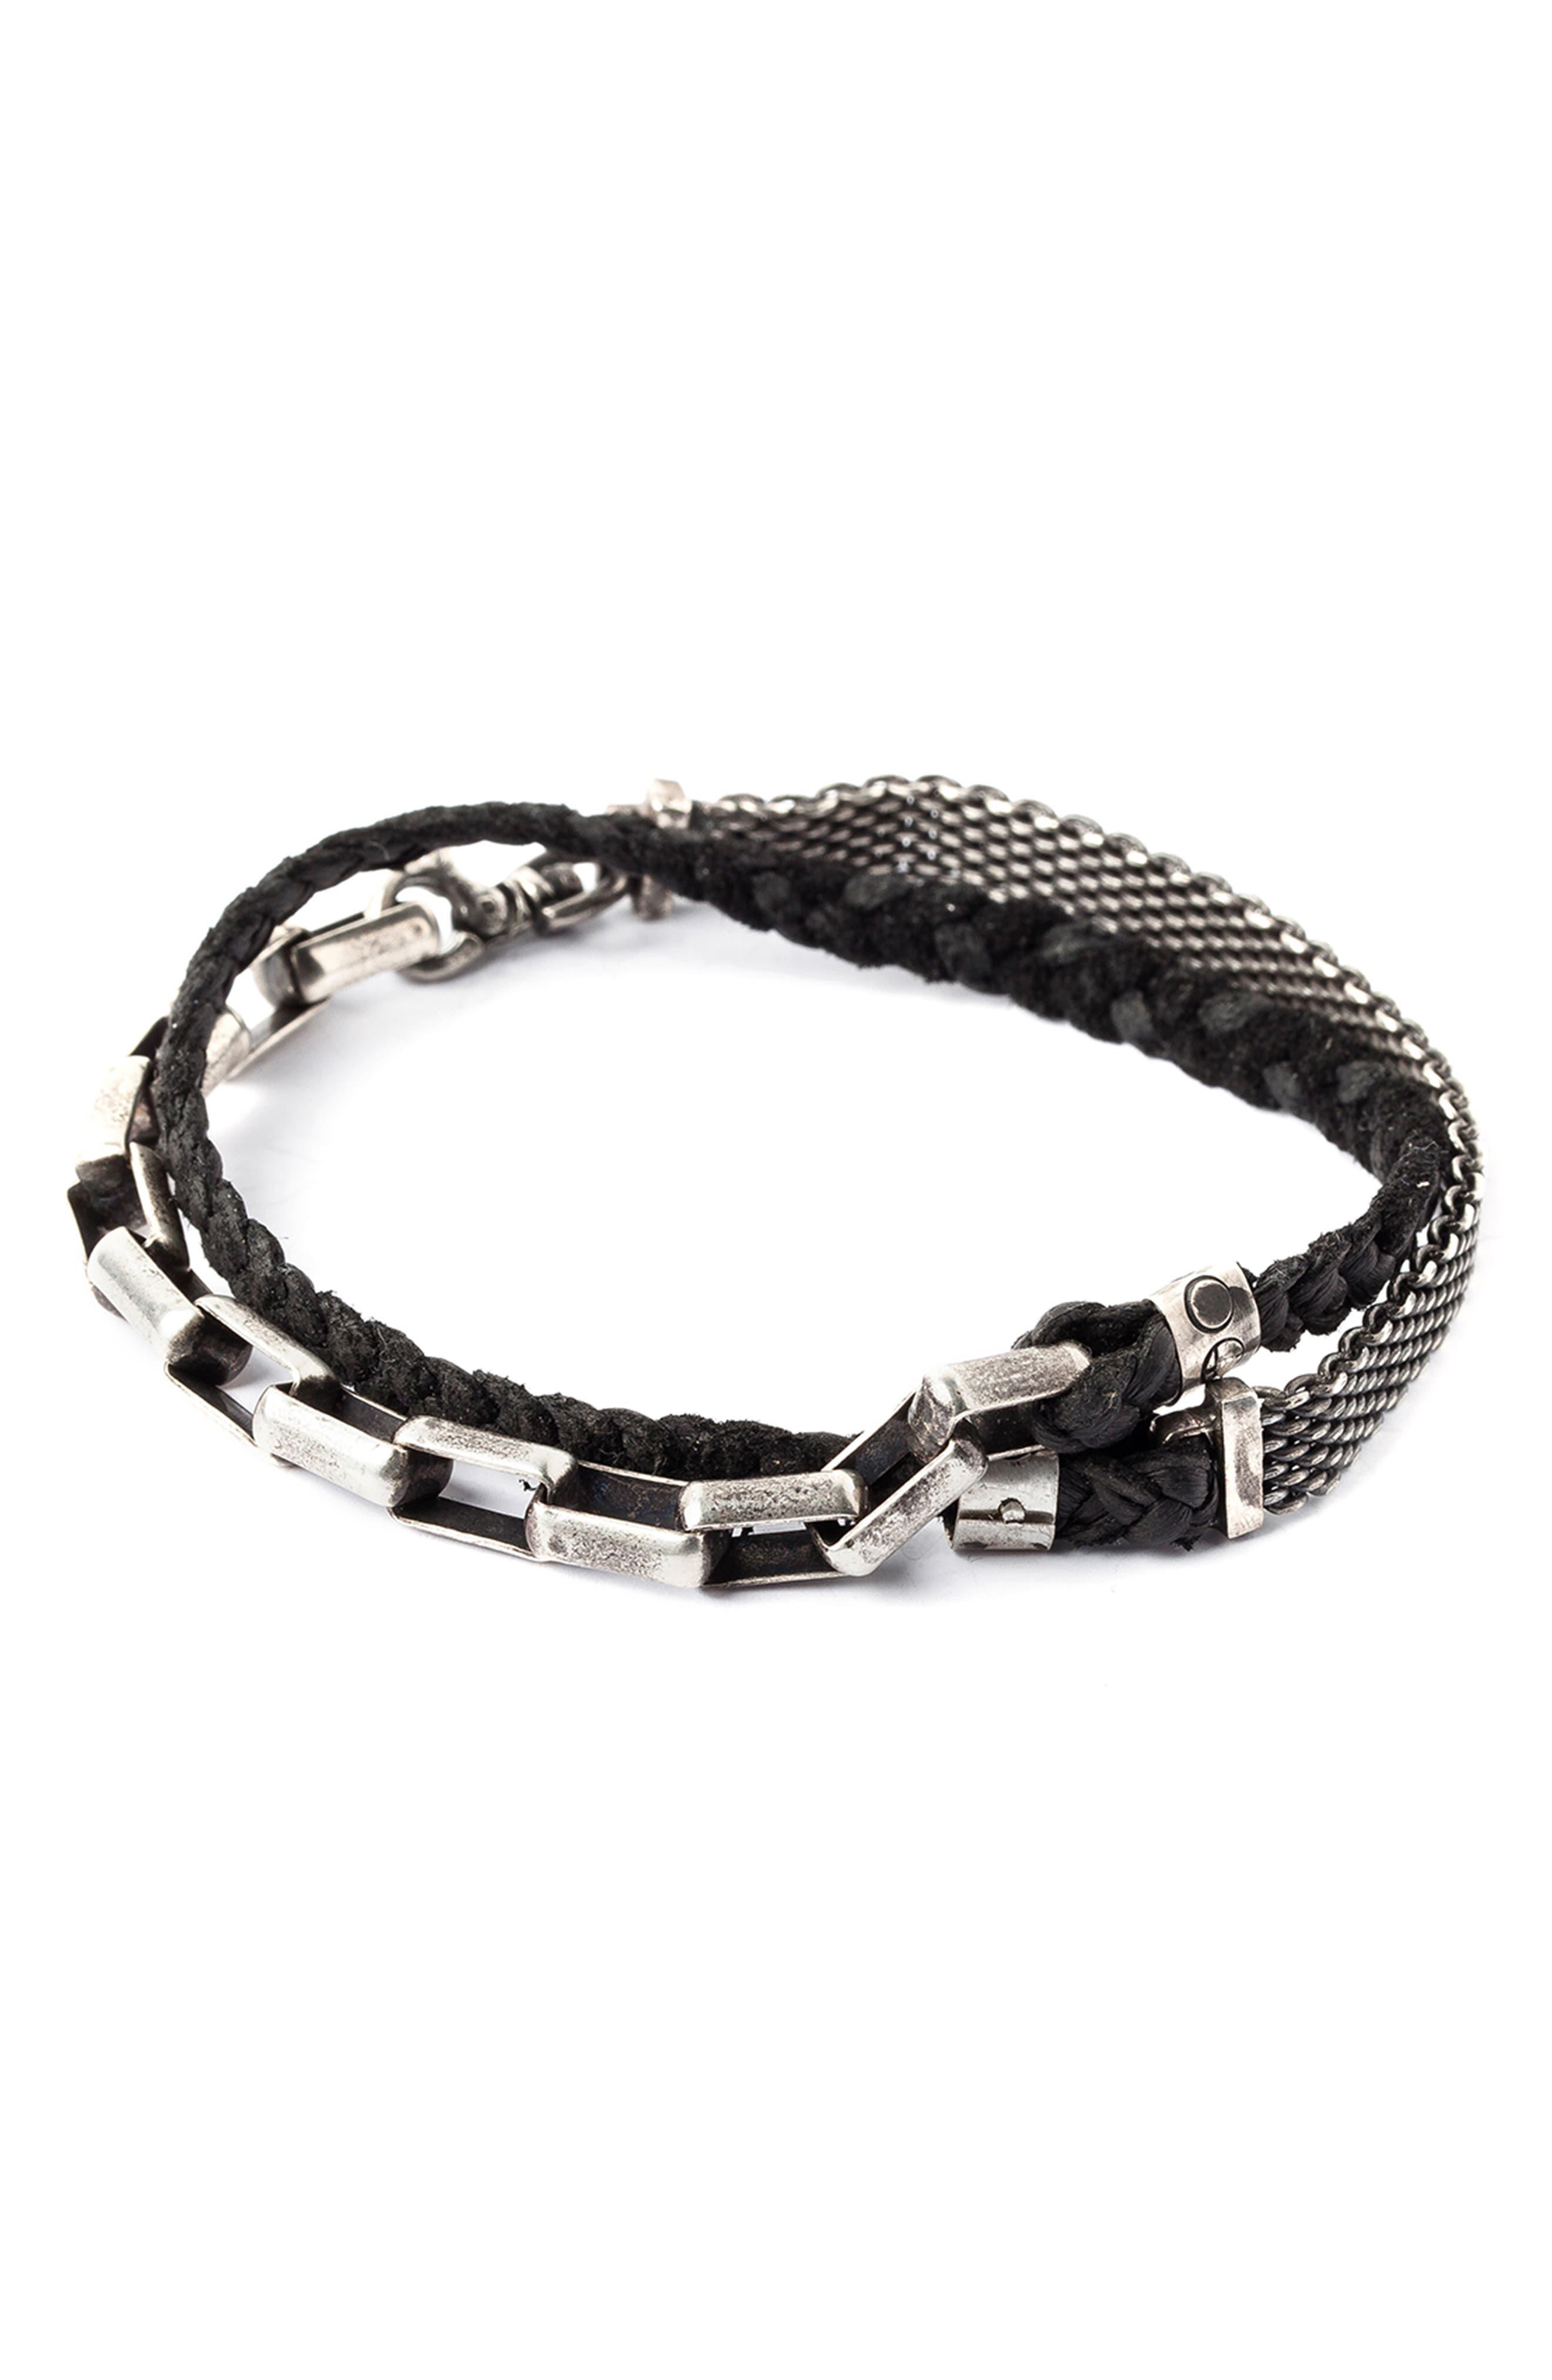 TITLE OF WORK Leather & Sterling Silver Wrap Bracelet in Silver/ Black